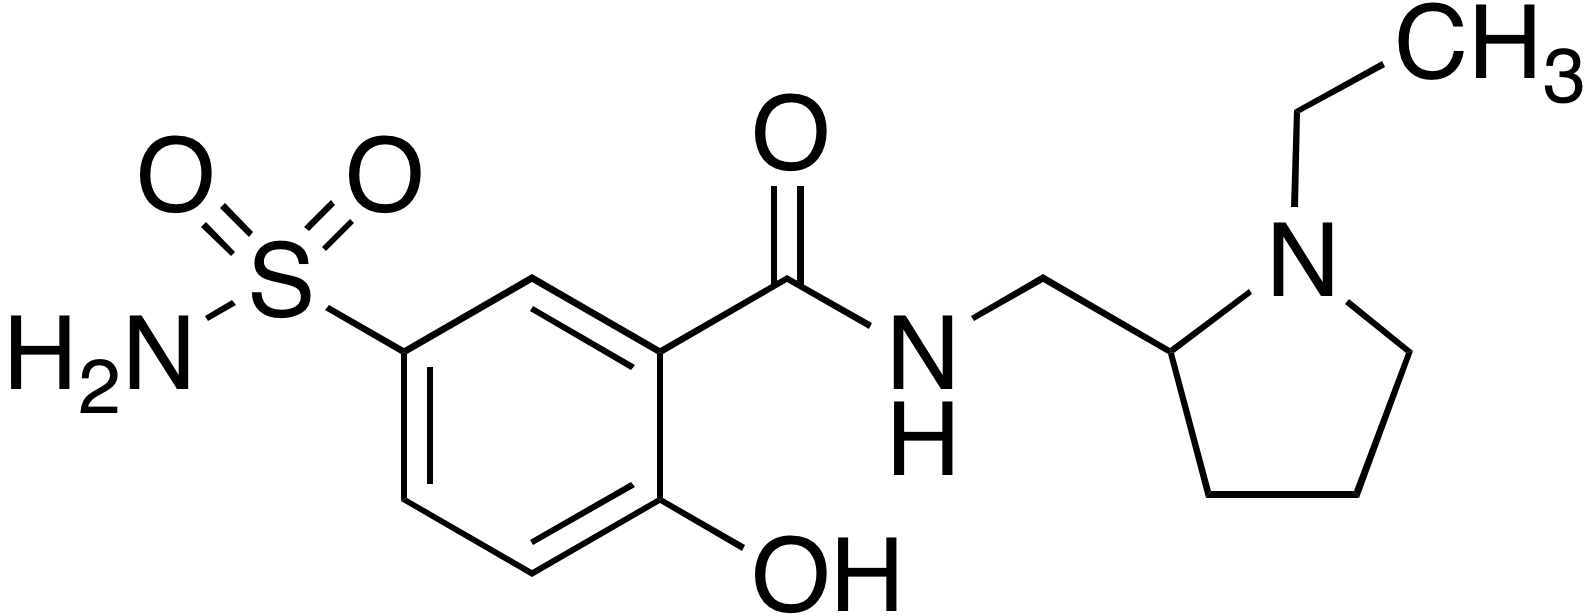 Desmethyl sulpiride